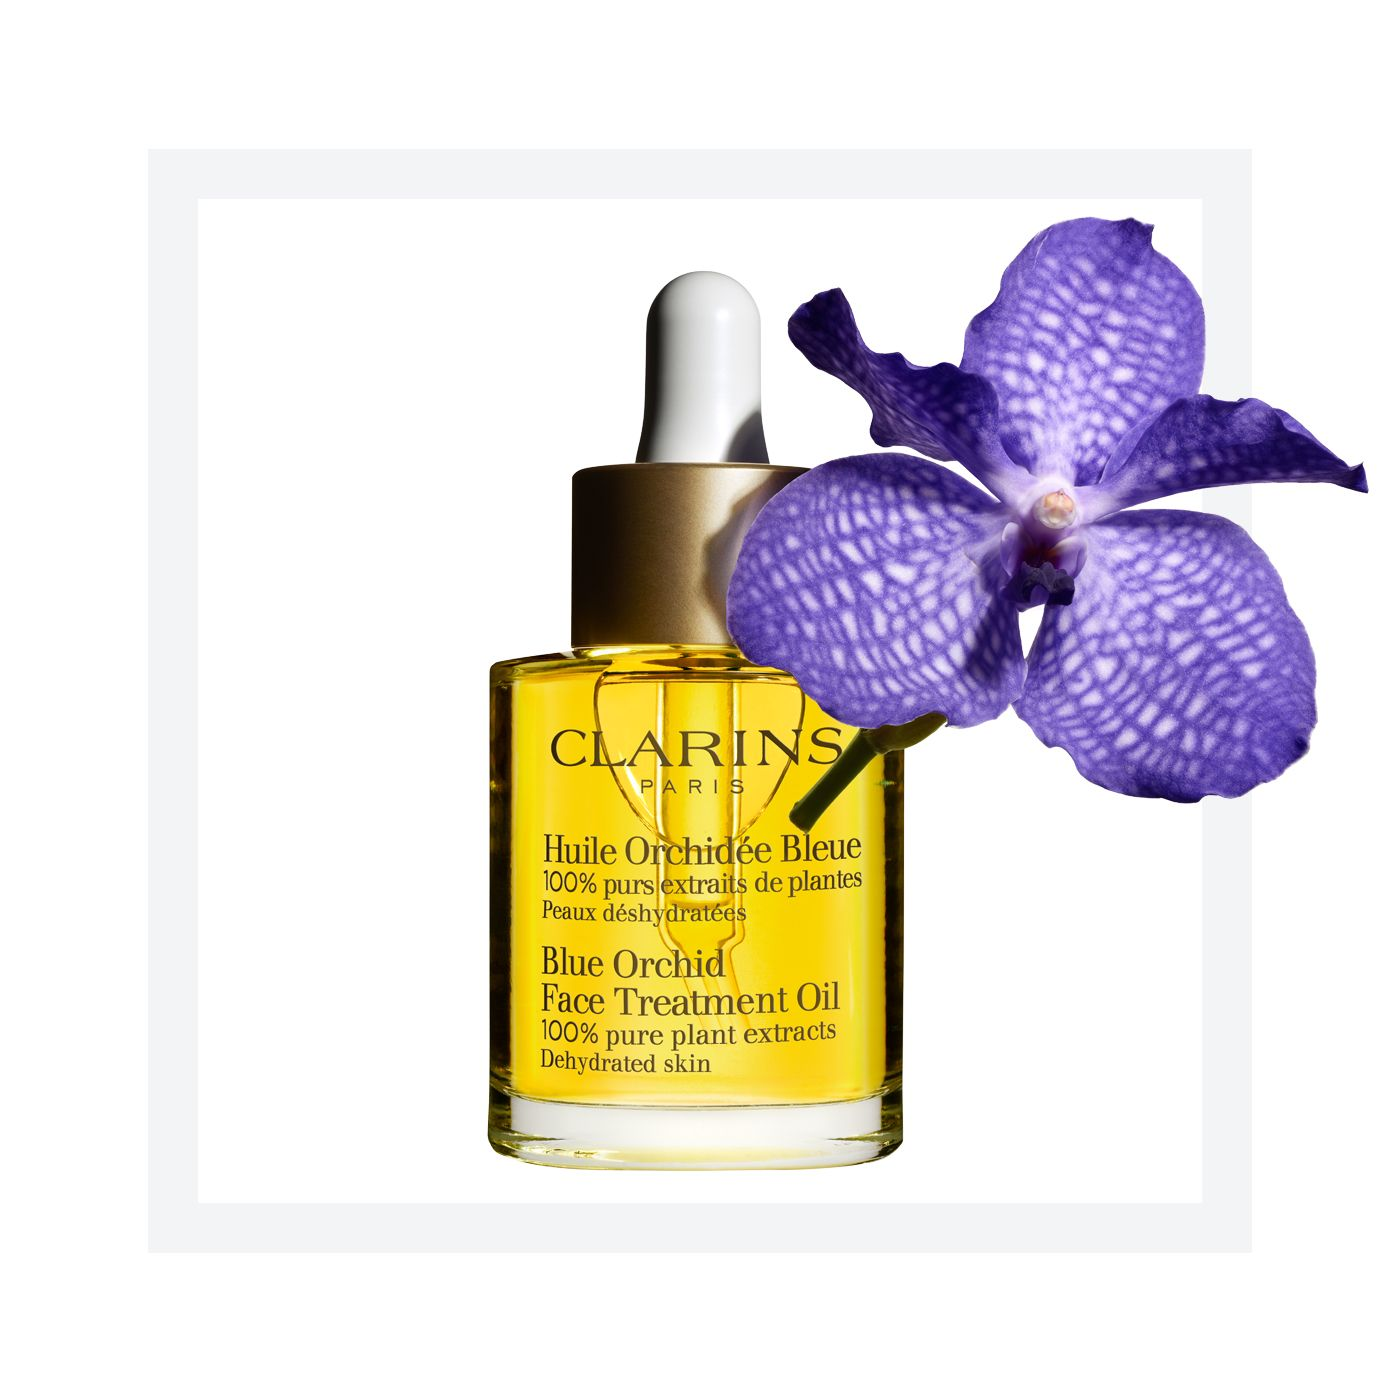 Blue Orchid Face Treatment Oil Face Treatment Clarins